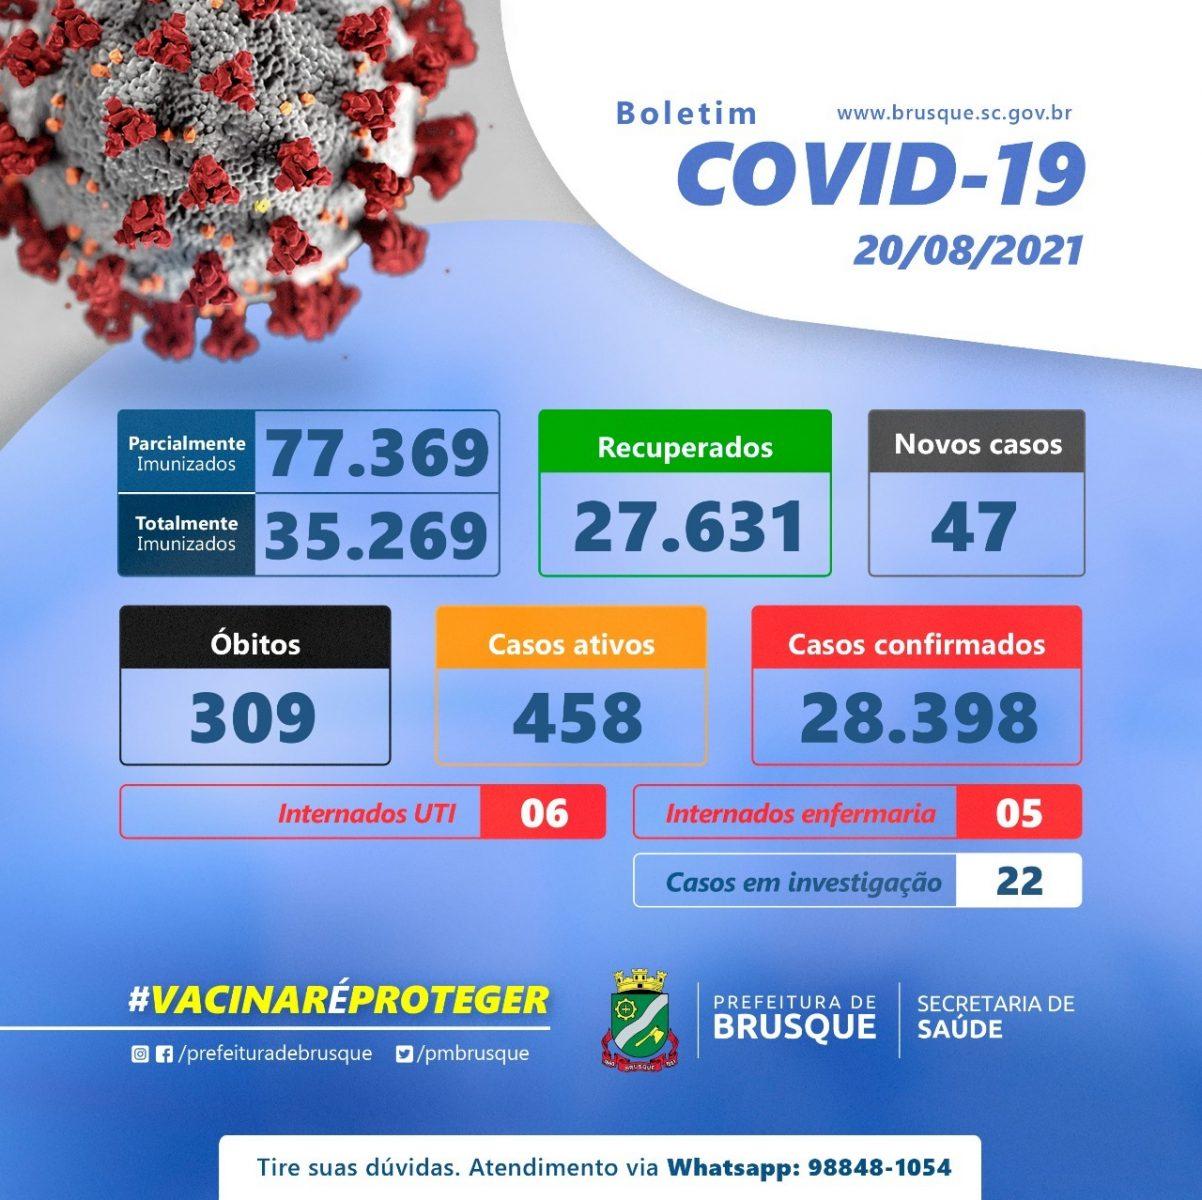 Covid-19: Confira o boletim epidemiológico desta sexta-feira (20)